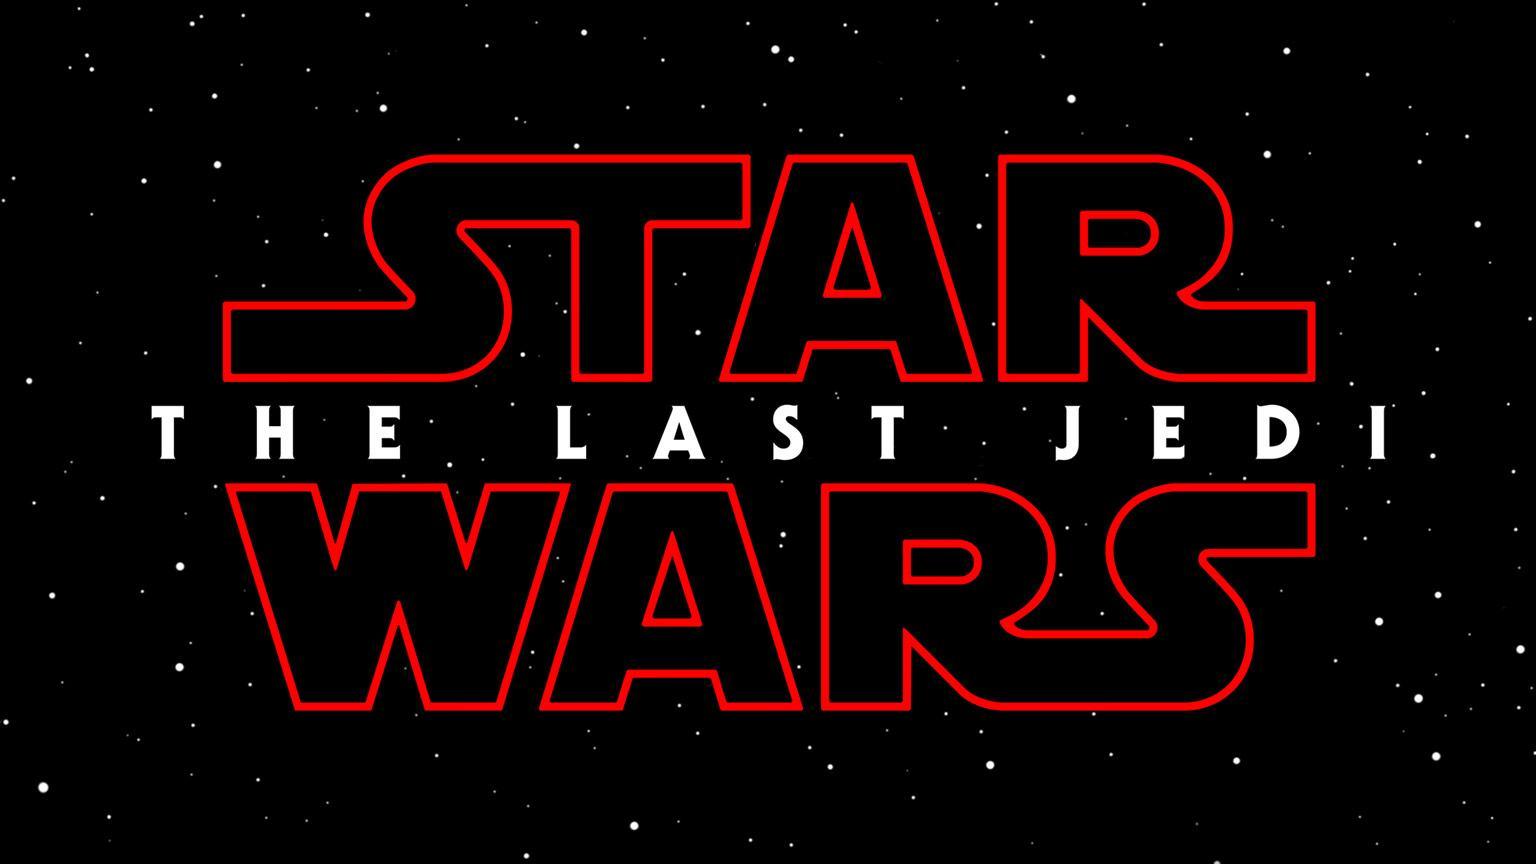 Star Wars: The Last Jedi | John Williams já está trabalhando na trilha do filme